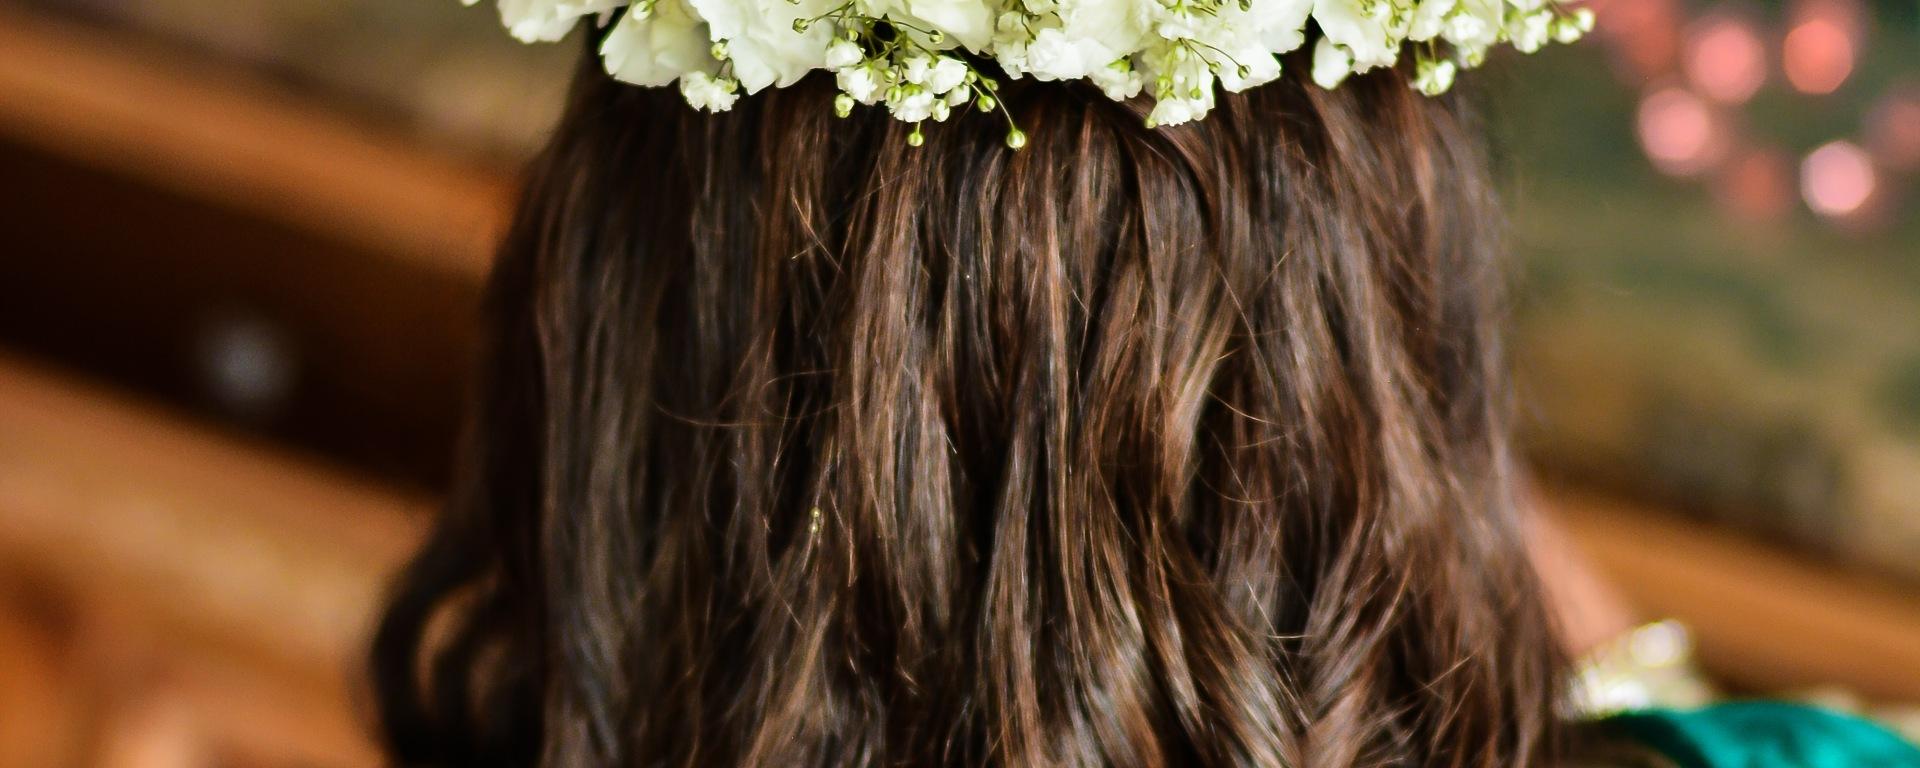 Indian bride's hair and makeup at her mehndi